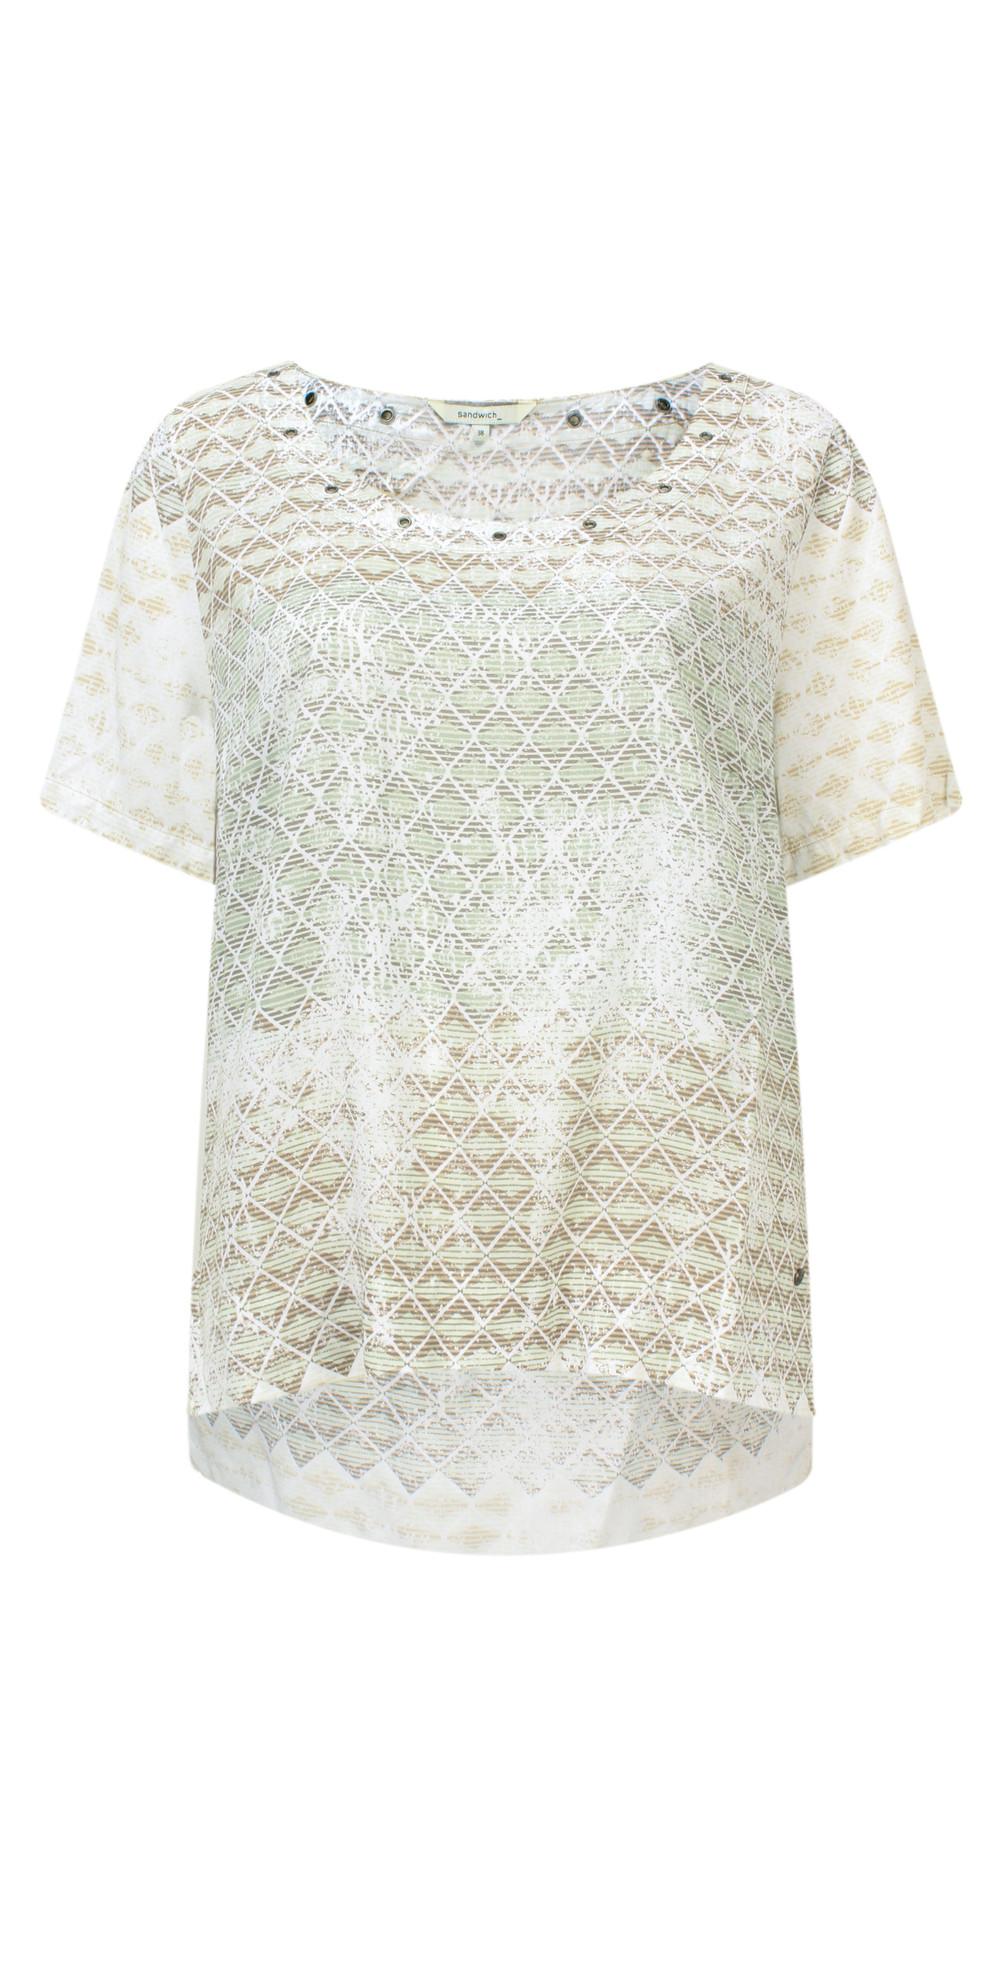 Diamond Check Short Sleeve Blouse main image